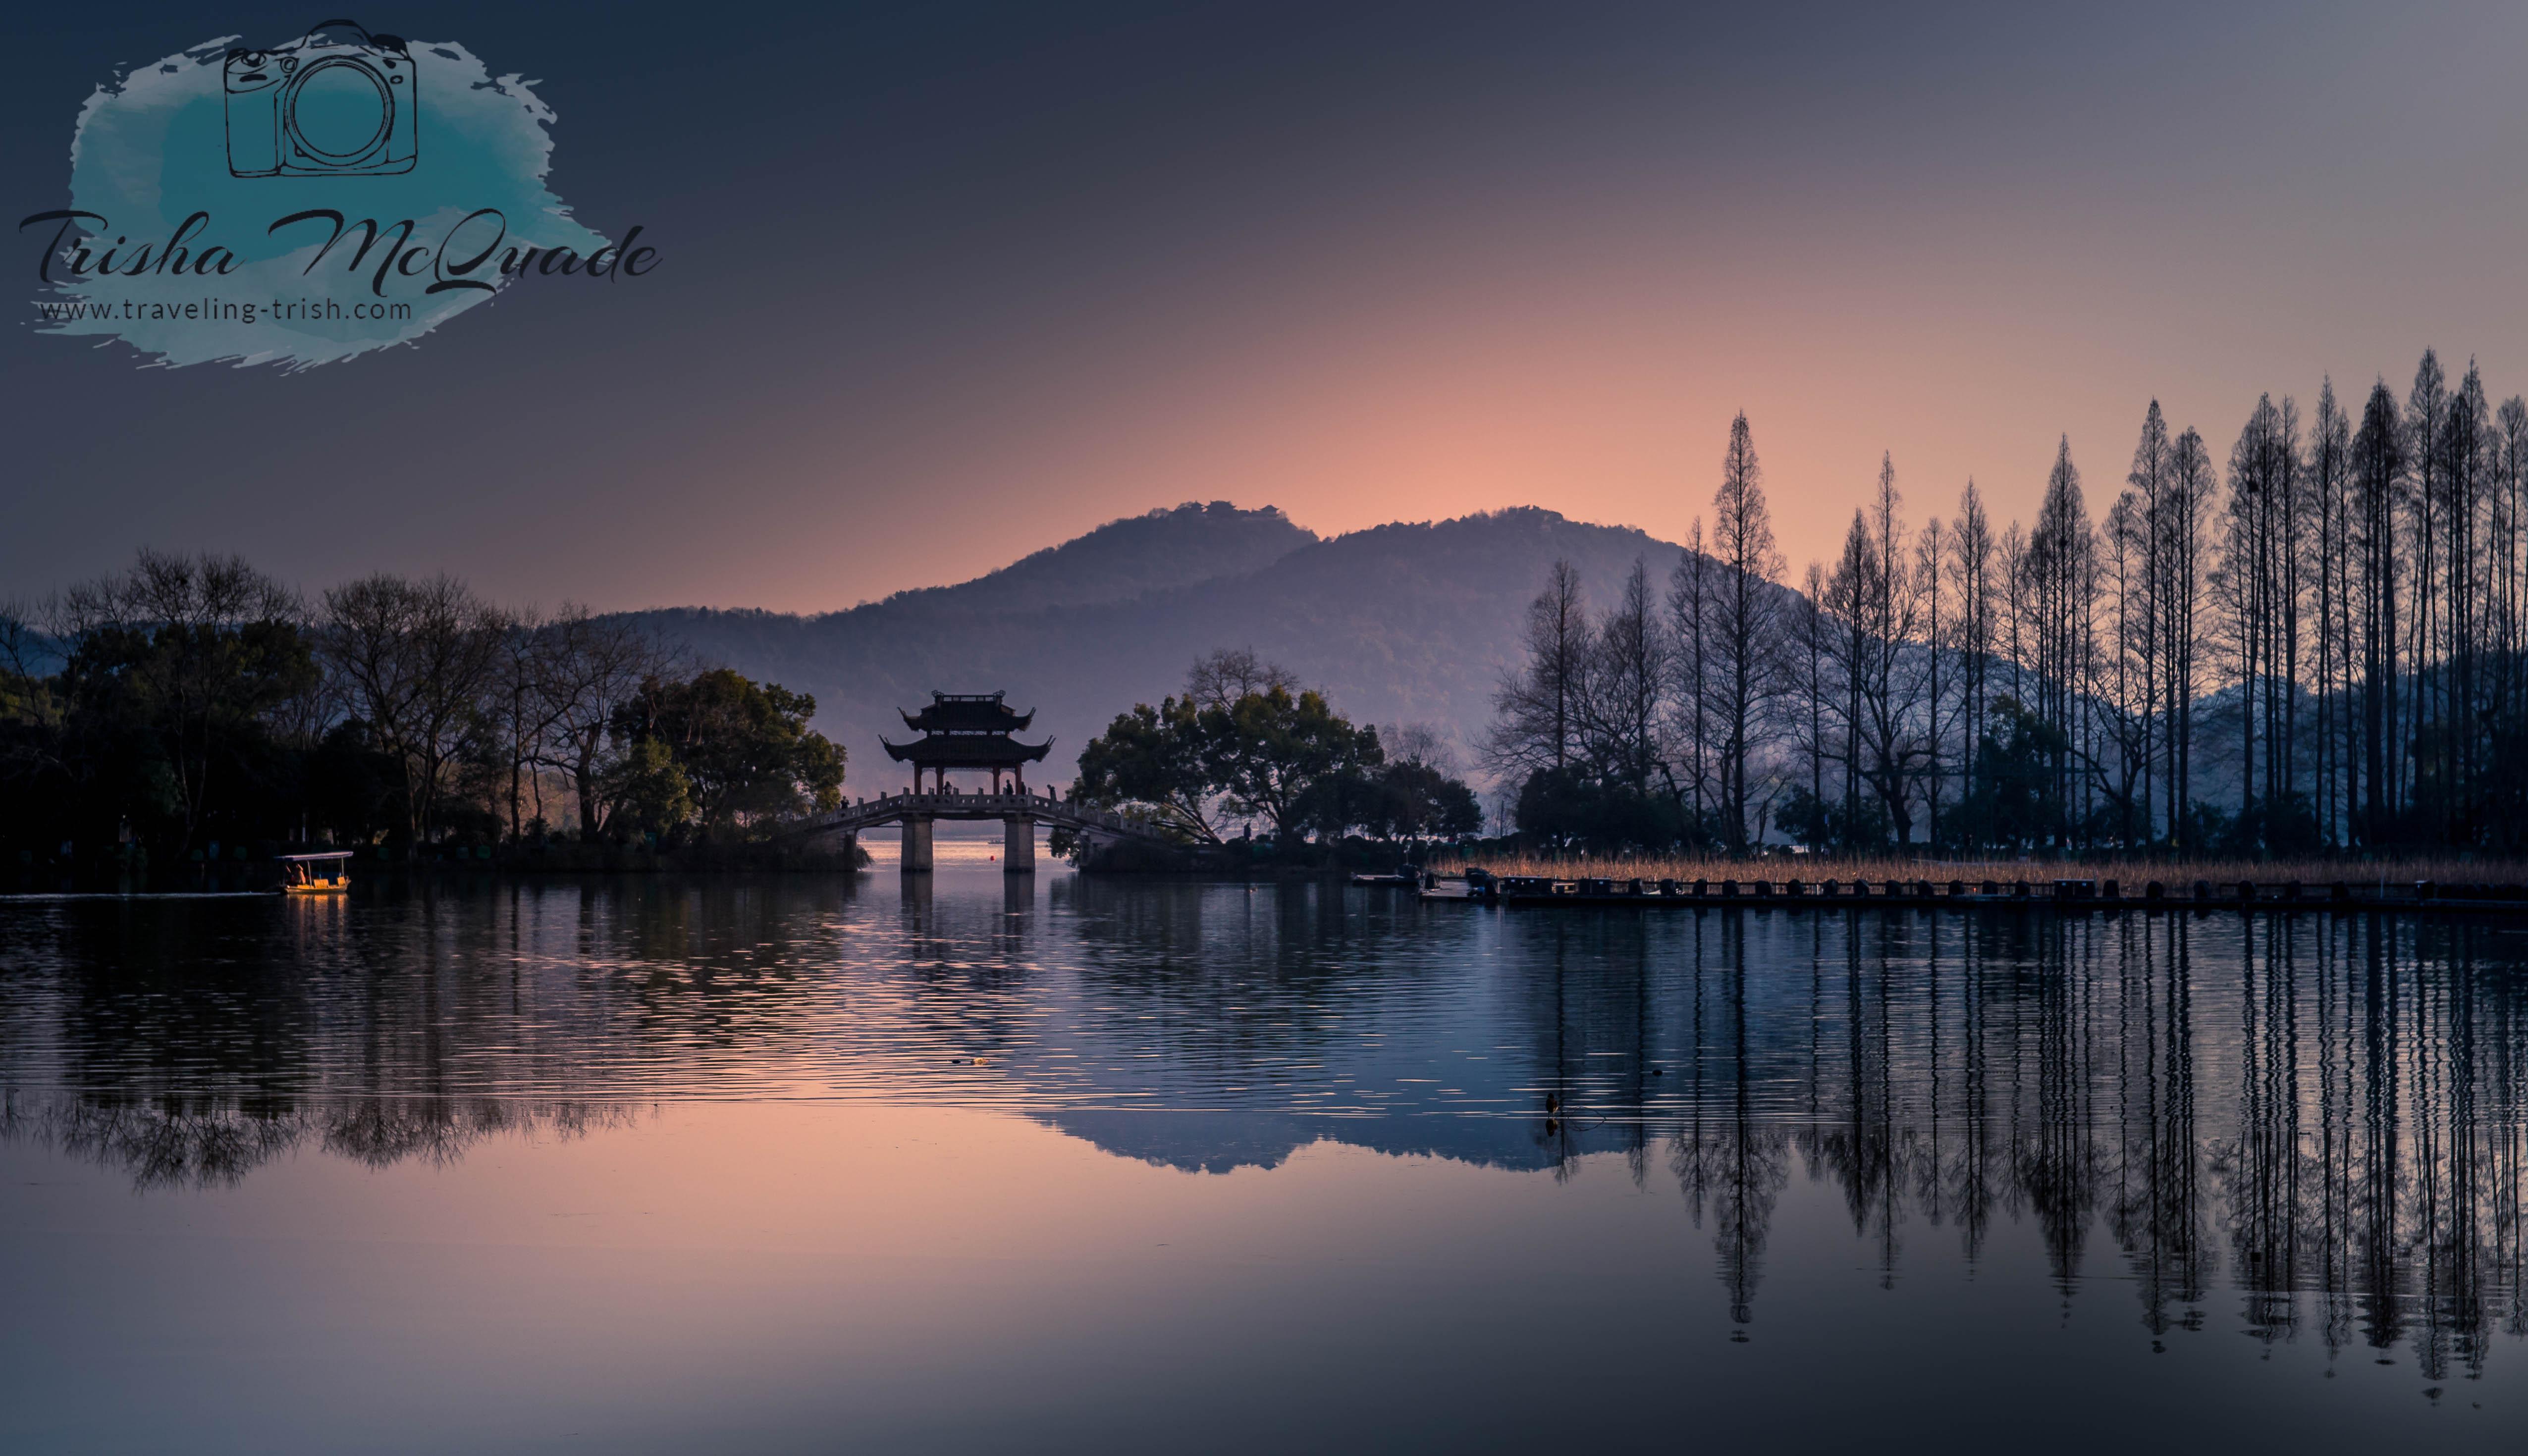 Pagoda Mountains